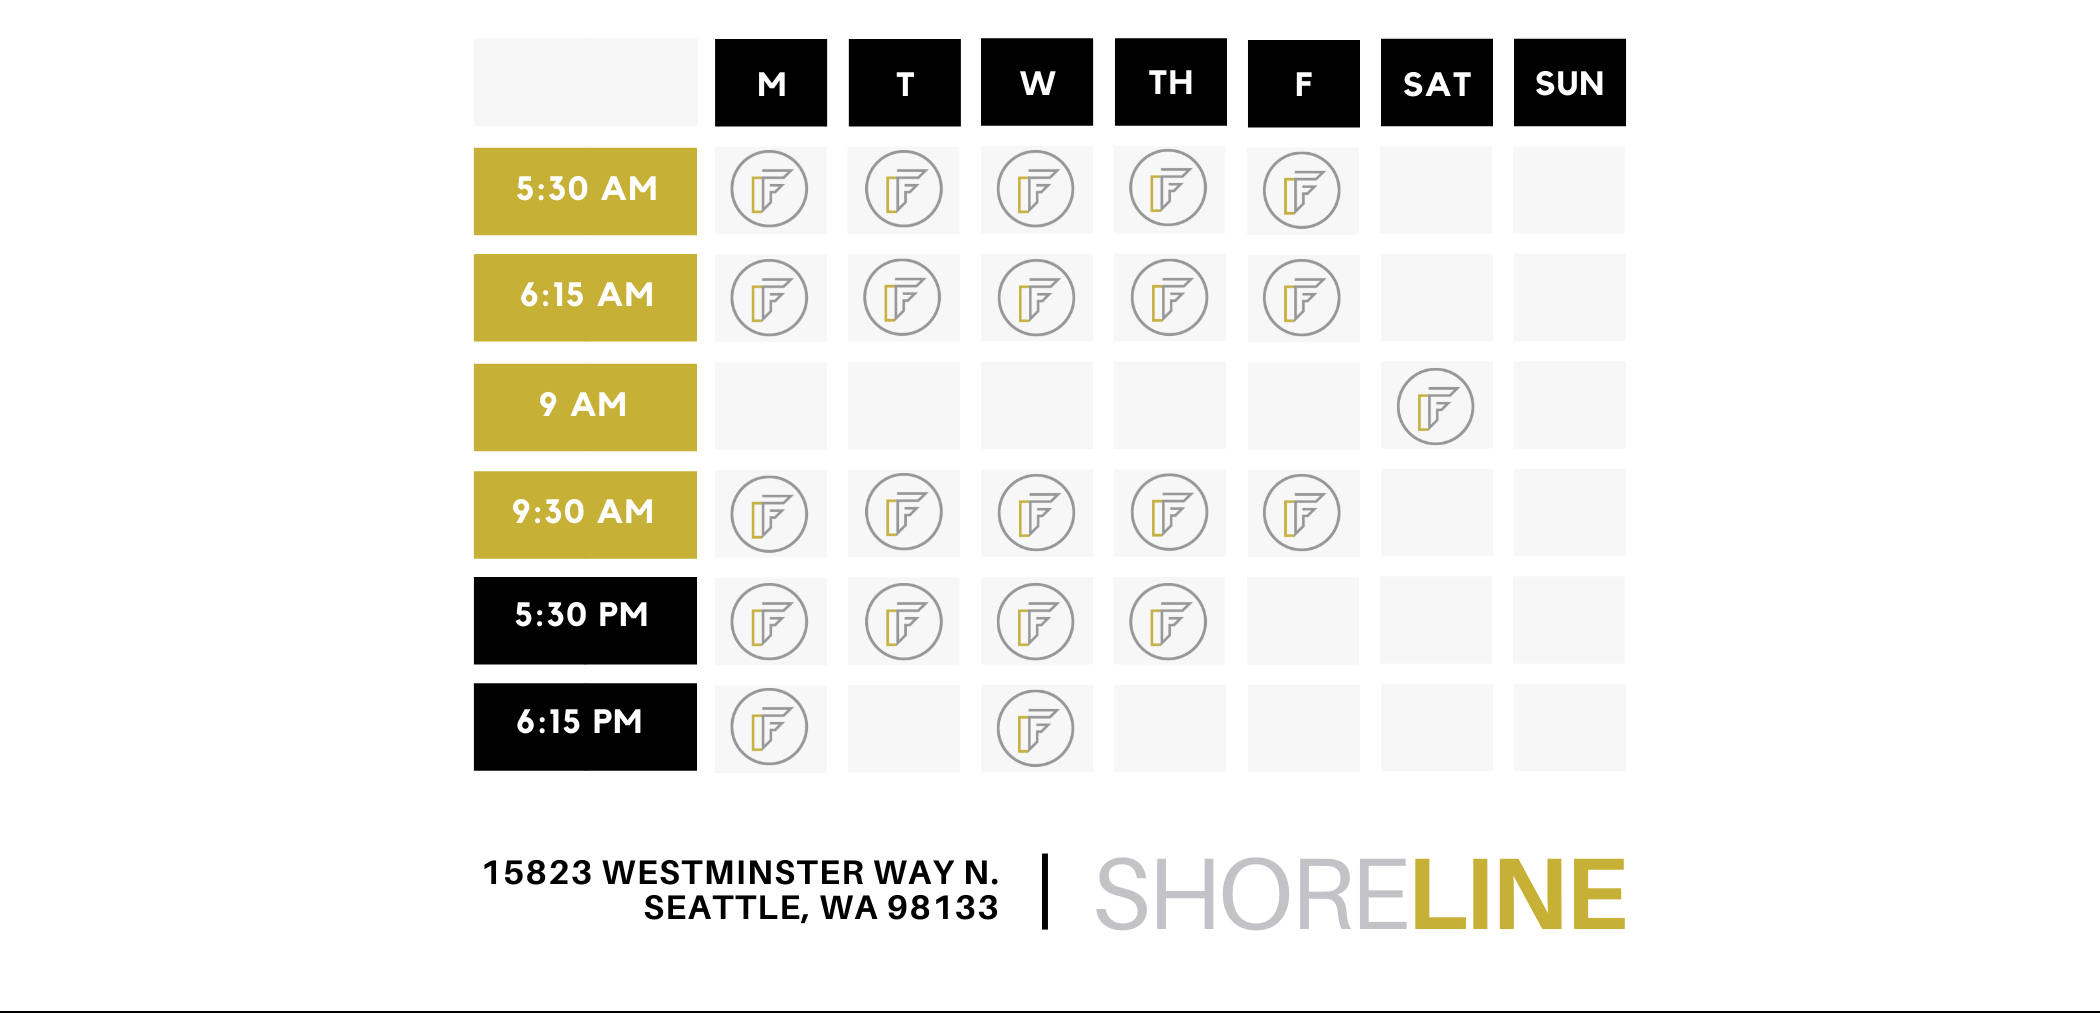 Shoreline Schedule